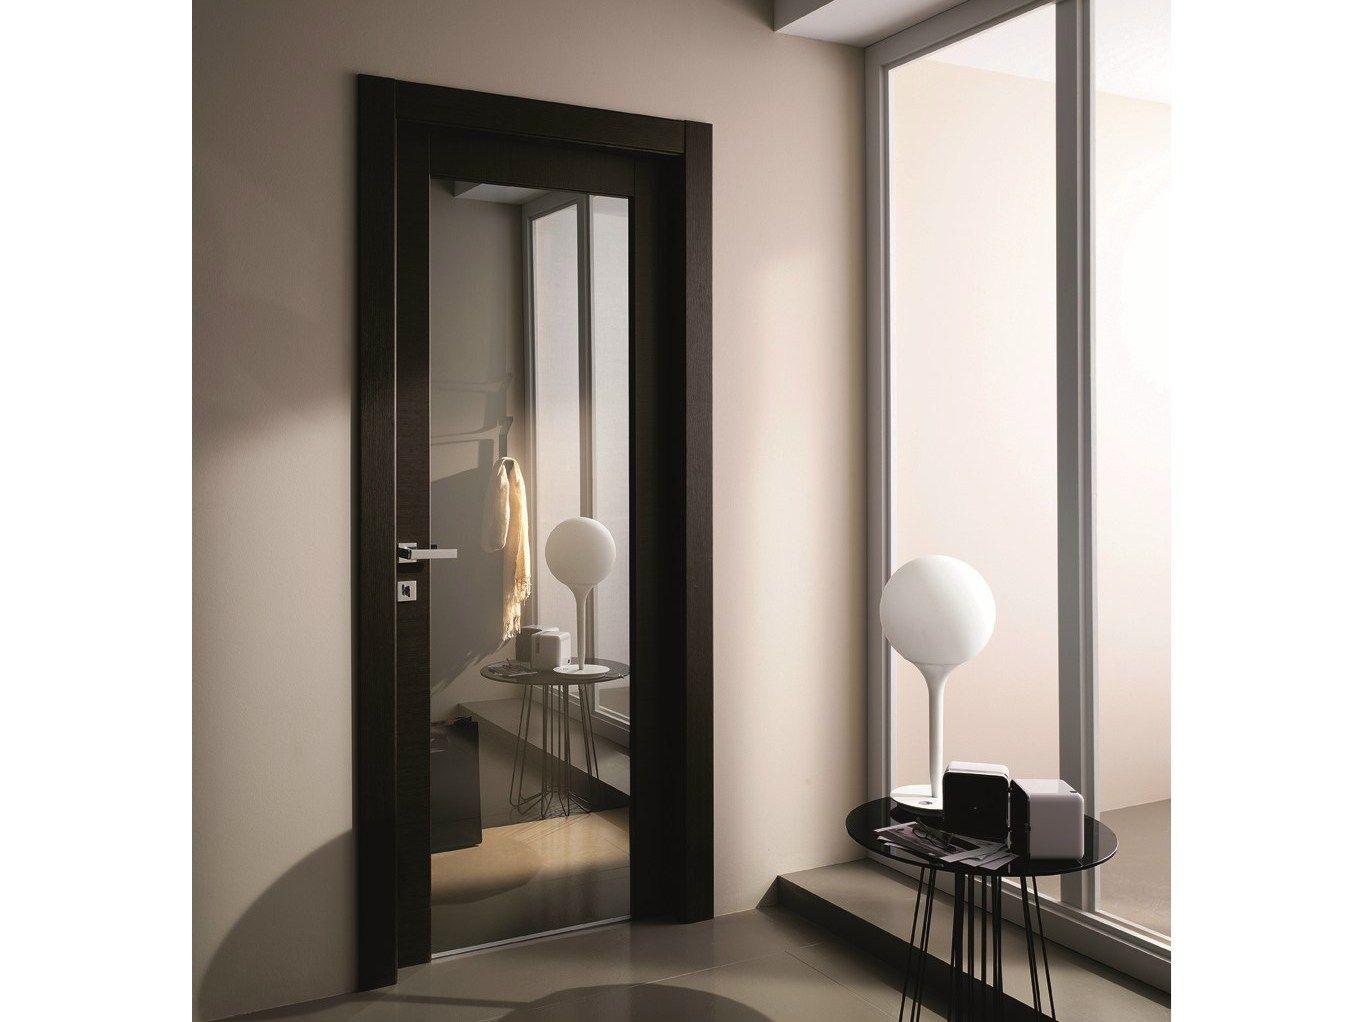 Stilia puerta de vidrio efecto espejo by gidea - Porte con specchio ...